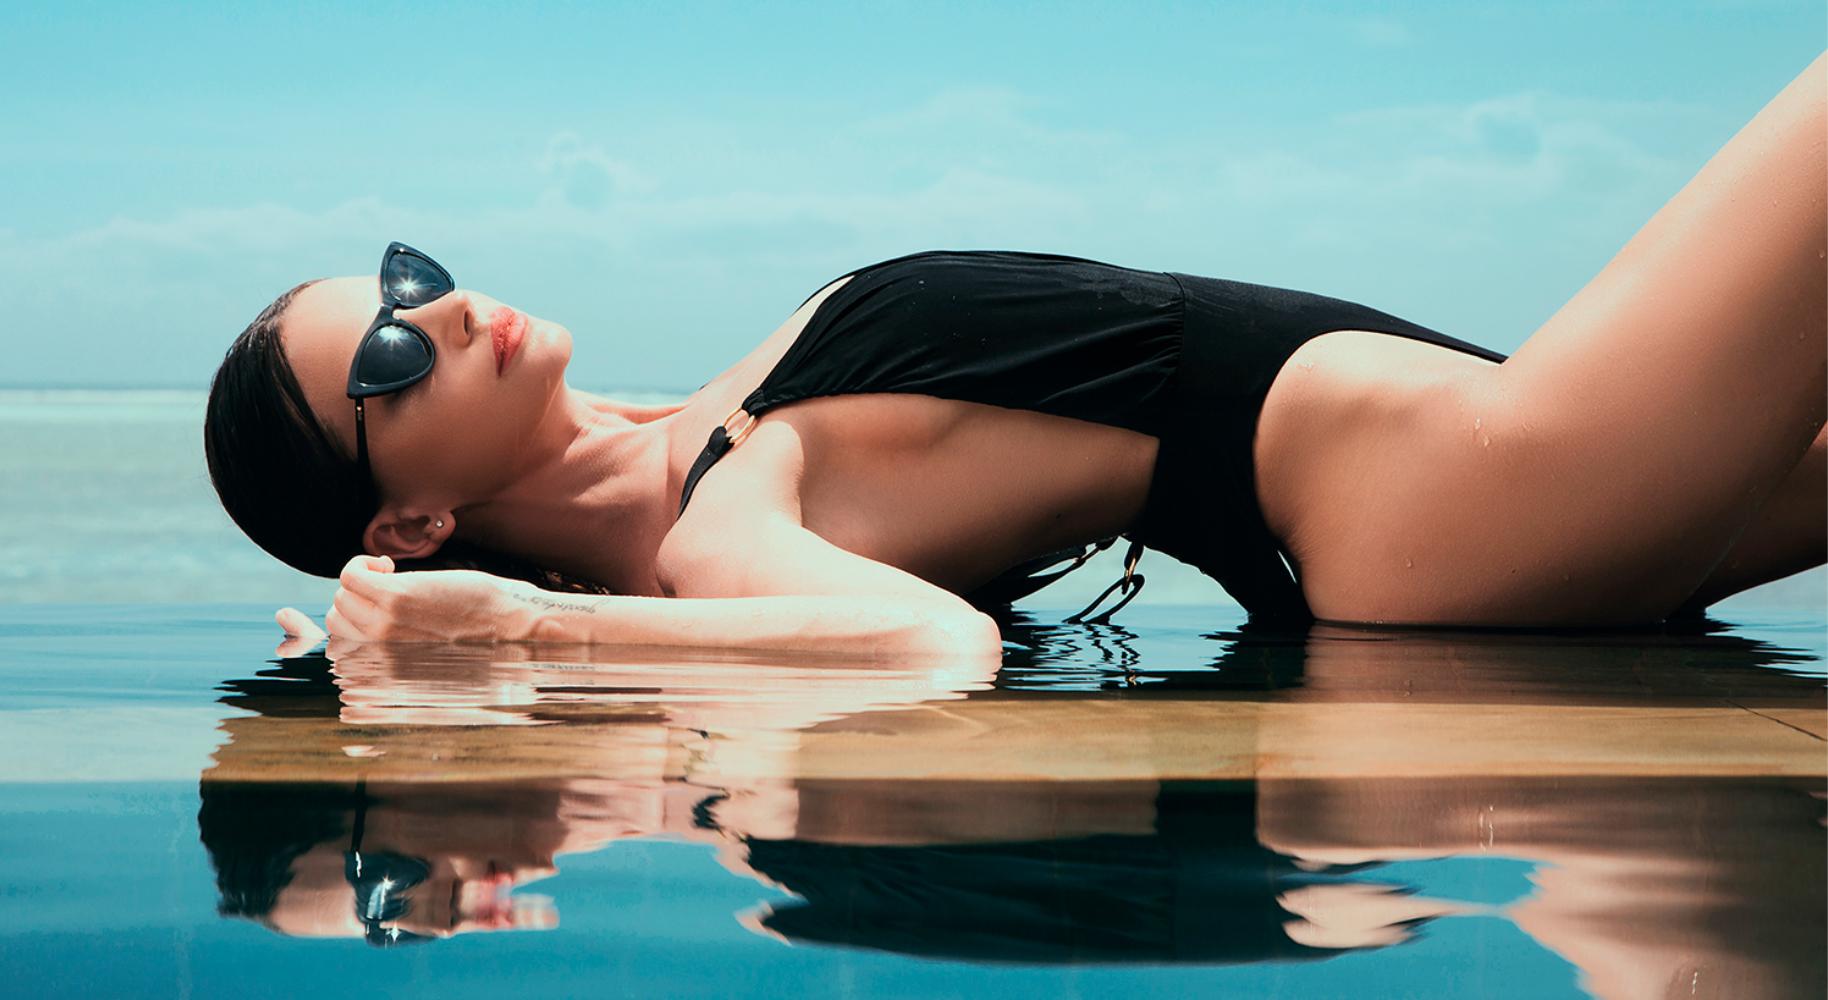 Диляна Попова с ексклузивна фотосесия на Малдивите за ZEISS VISION CENTER, Grand Optics & Joy Optics